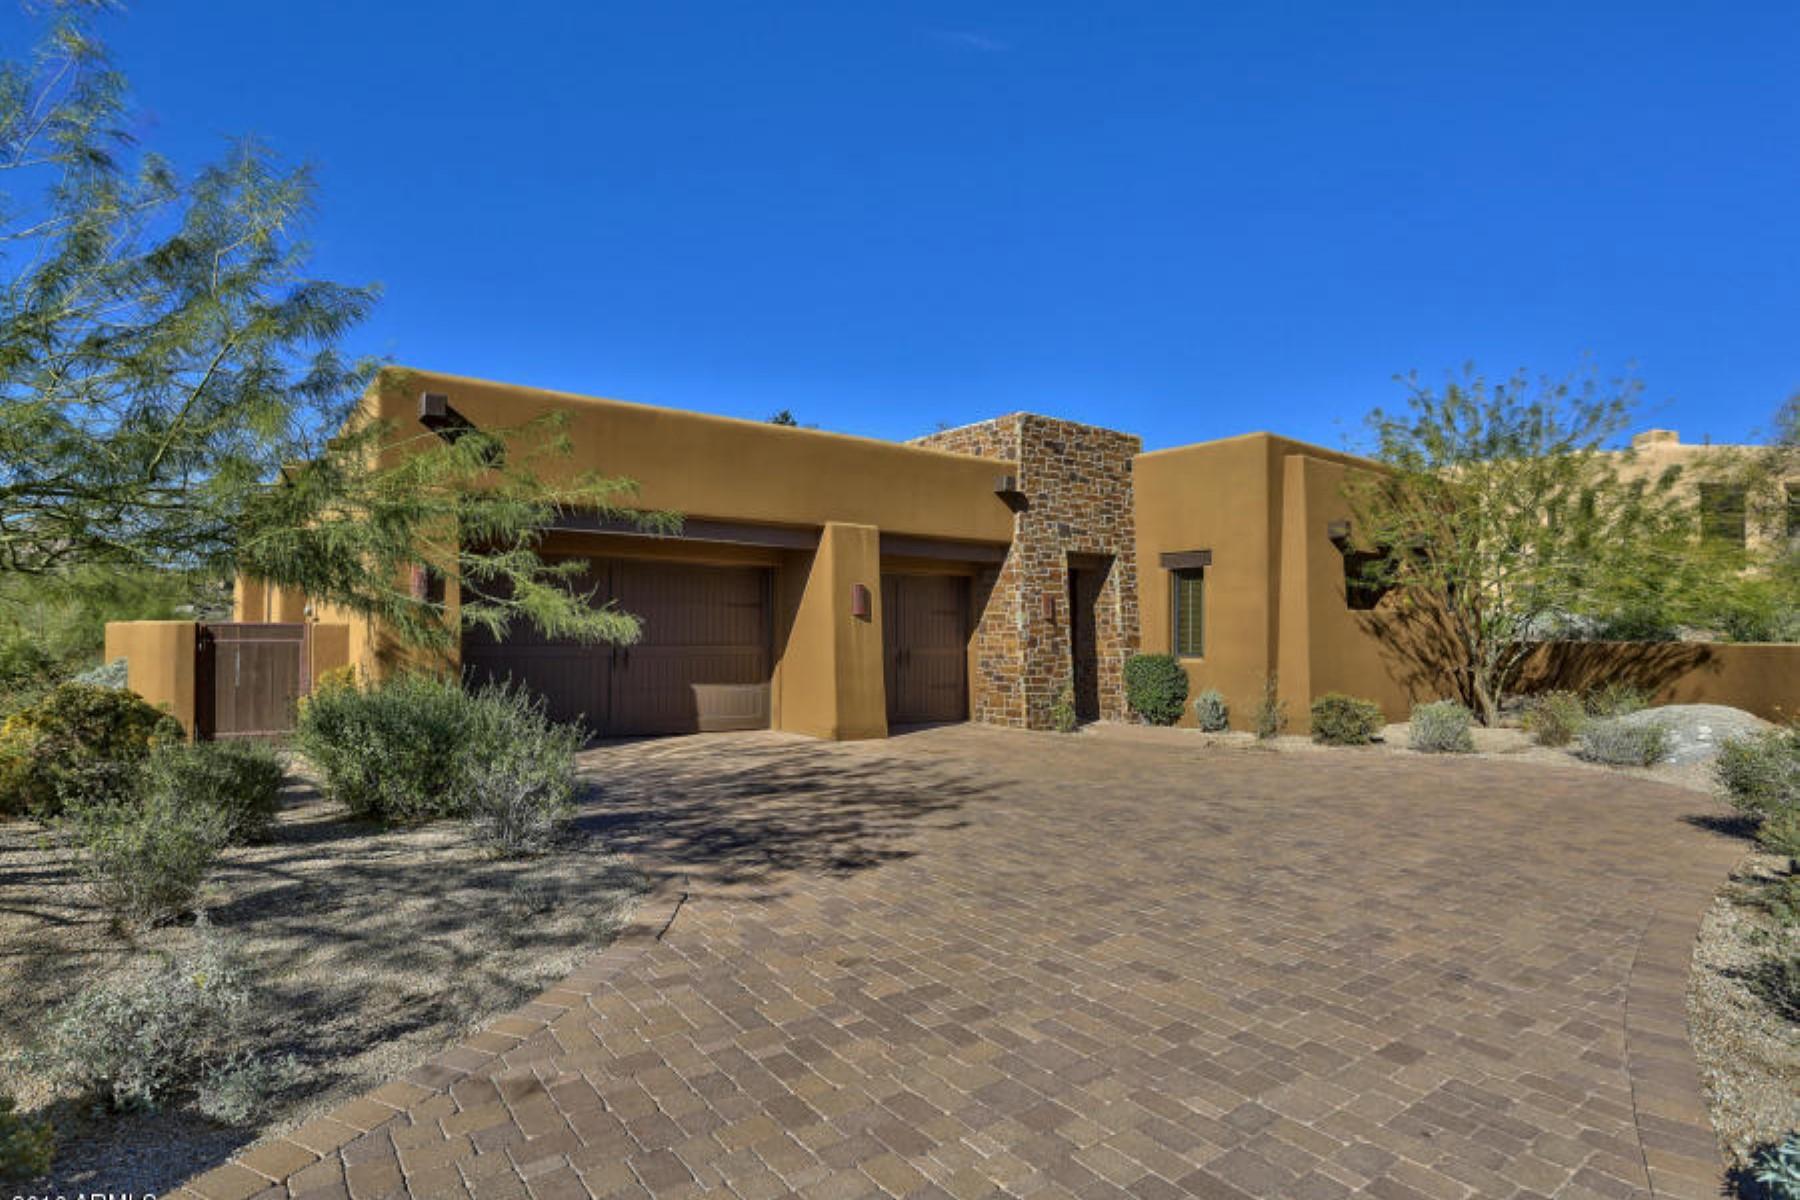 Einfamilienhaus für Verkauf beim One of only a four homes available at the Four Seasons resort 10585 E Crescent Moon Dr #40 Scottsdale, Arizona 85262 Vereinigte Staaten